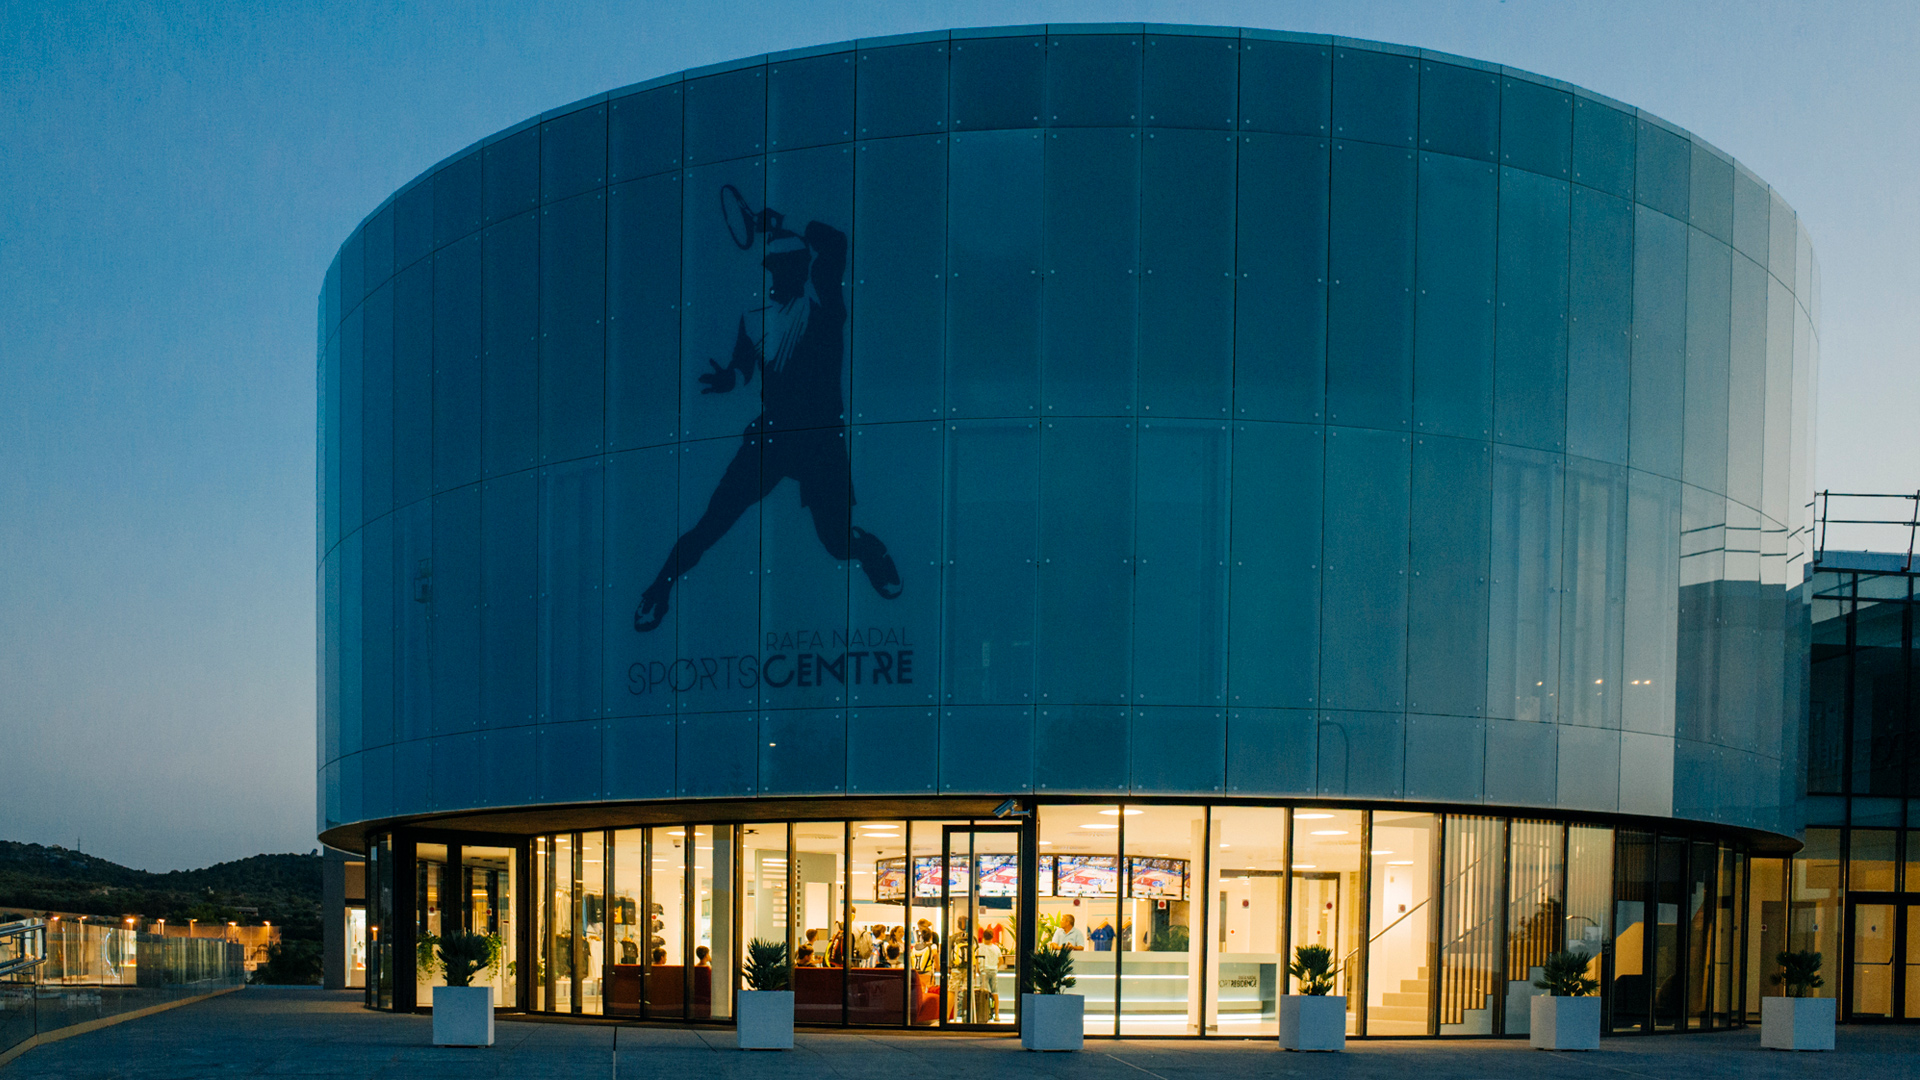 se493-0544-rafa-nadal-sports-centre.jpg